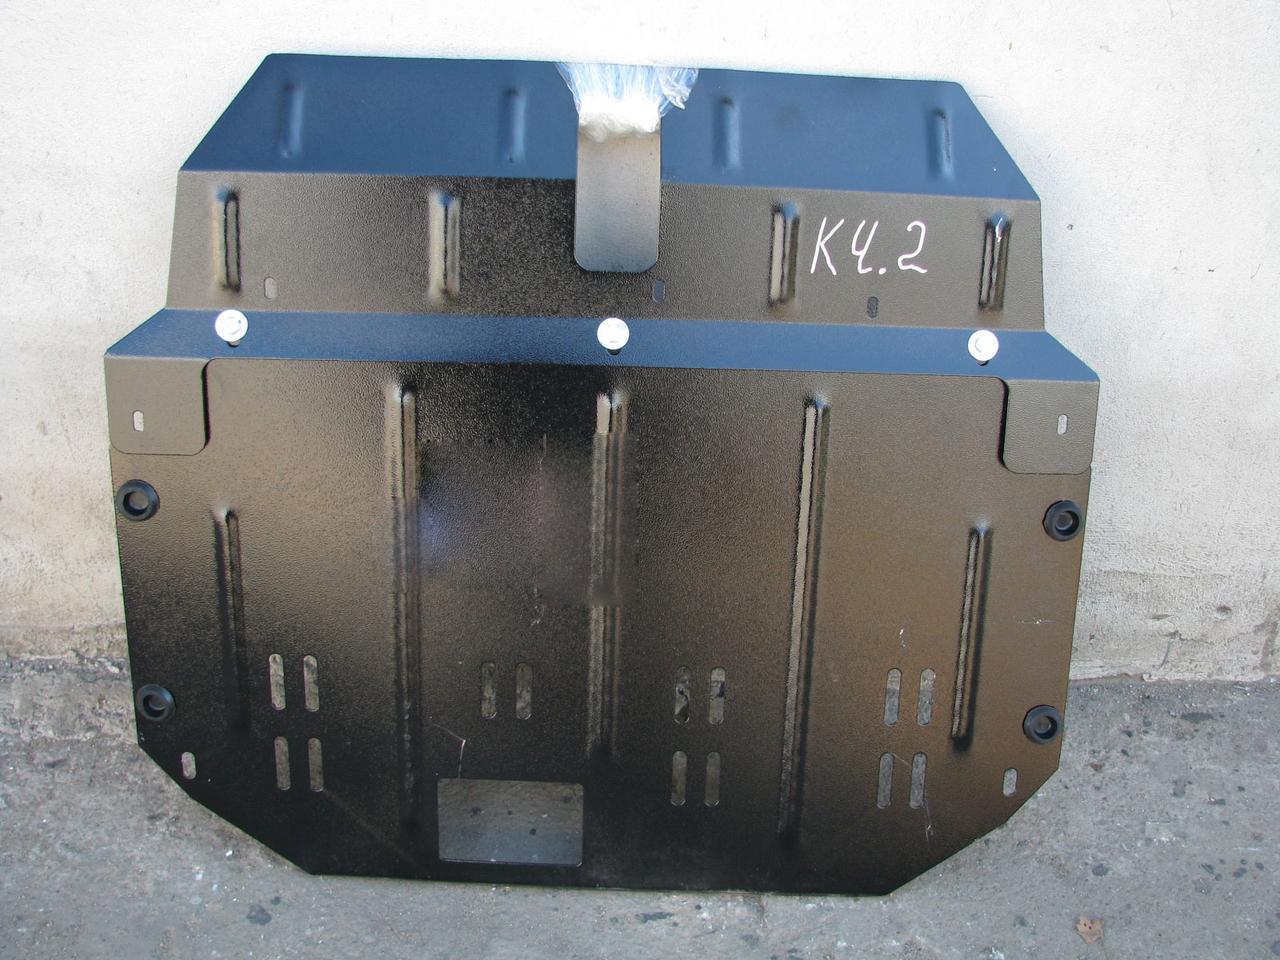 Захист двигуна KIA CERATO 2 2009-2012 АКПП 1.6, 2.0 (двигун+КПП)